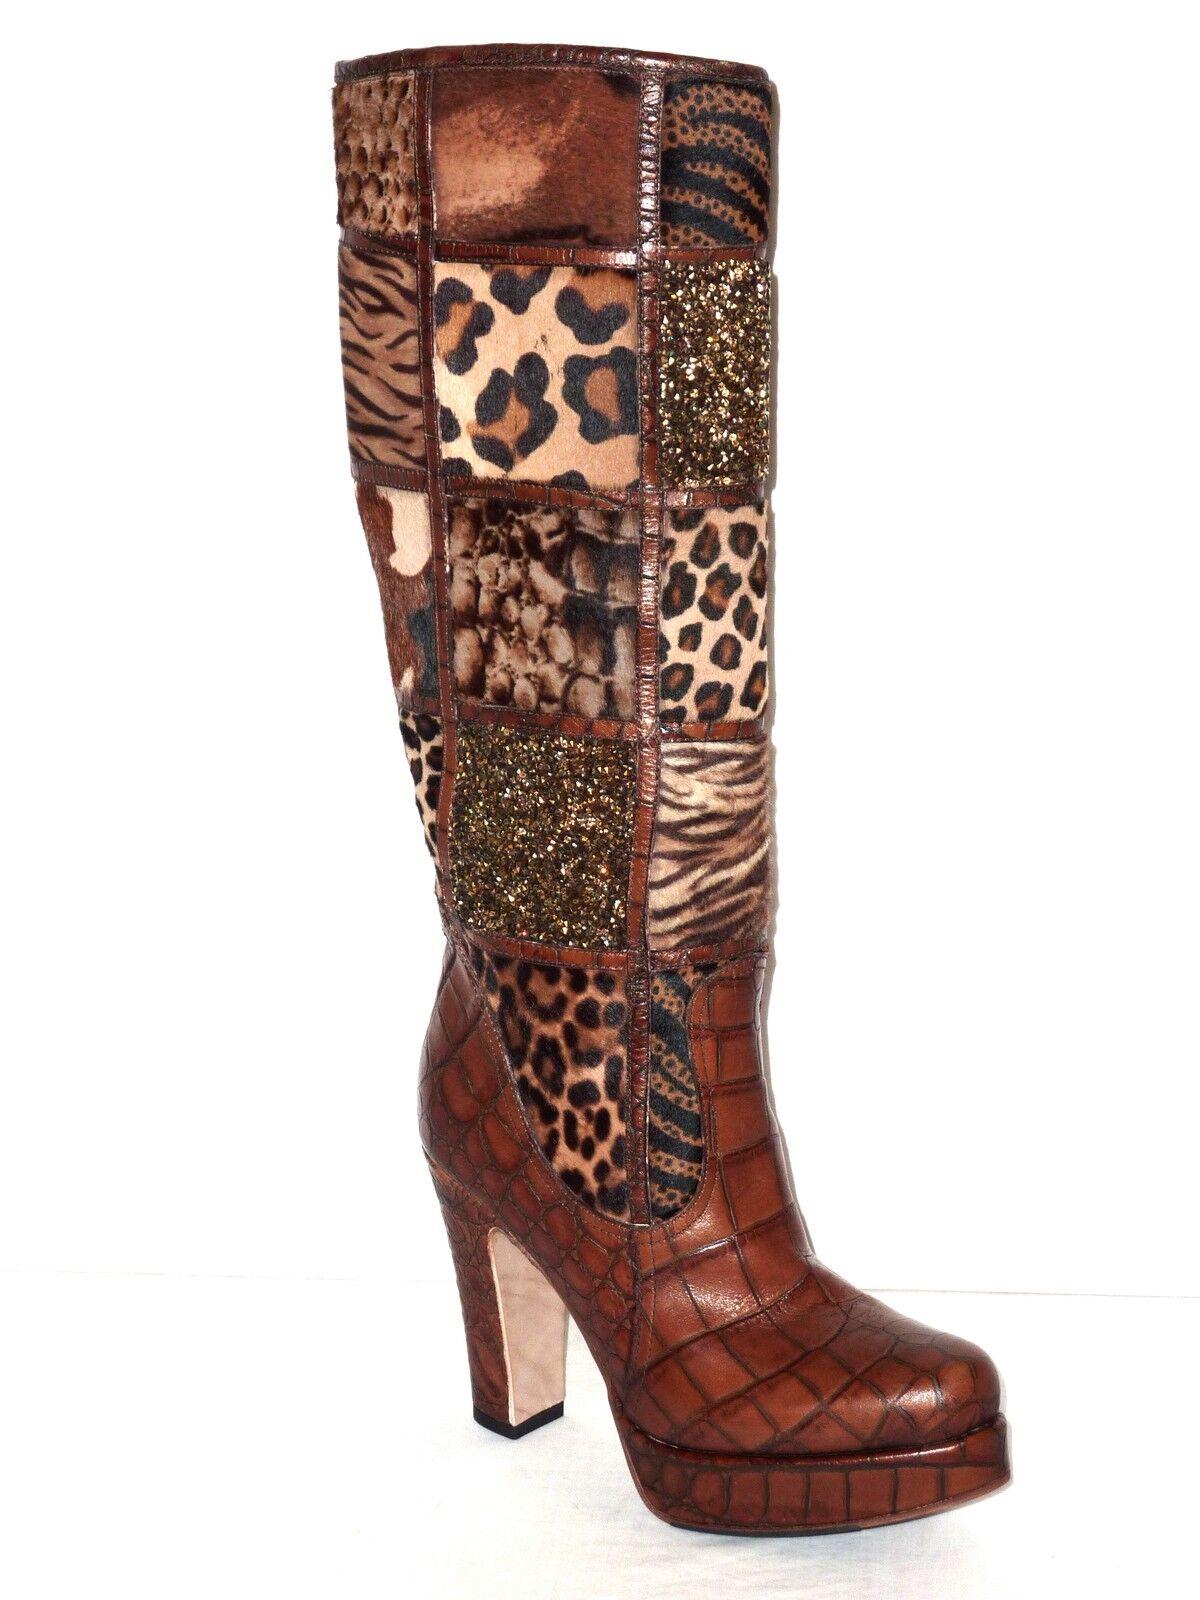 AMARANTI botas botas botas mujer PELO CAV.marrón E SWAROVSKY n.39 626db6